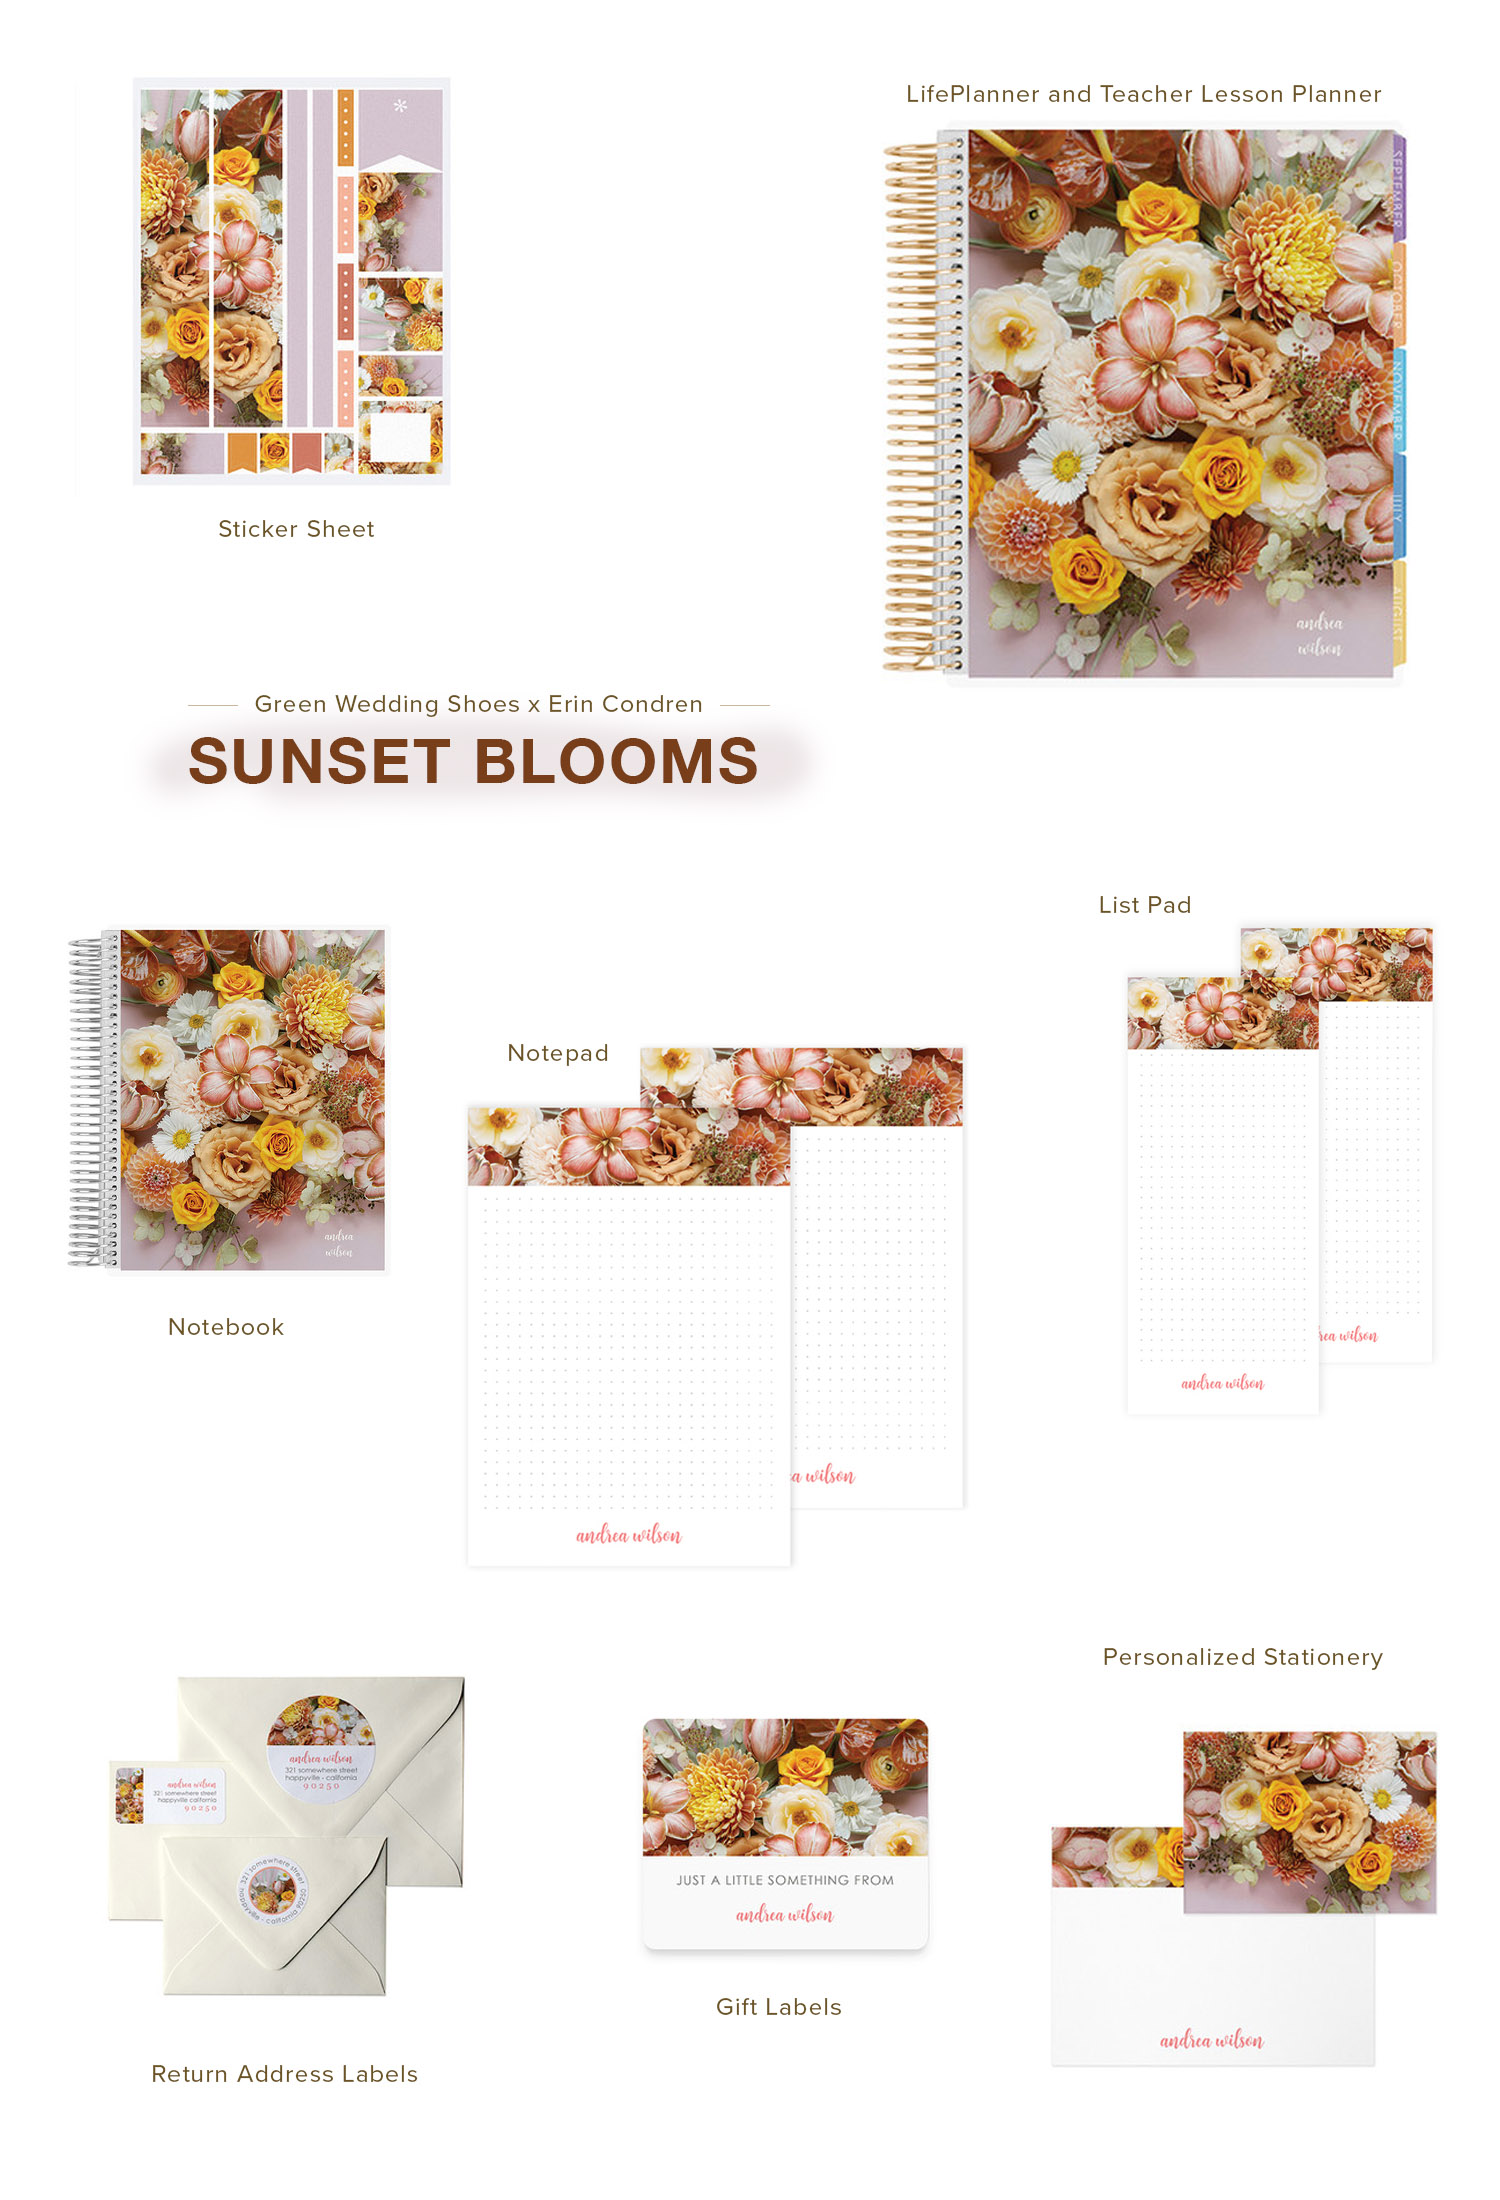 Sunset Blooms LifePlanner